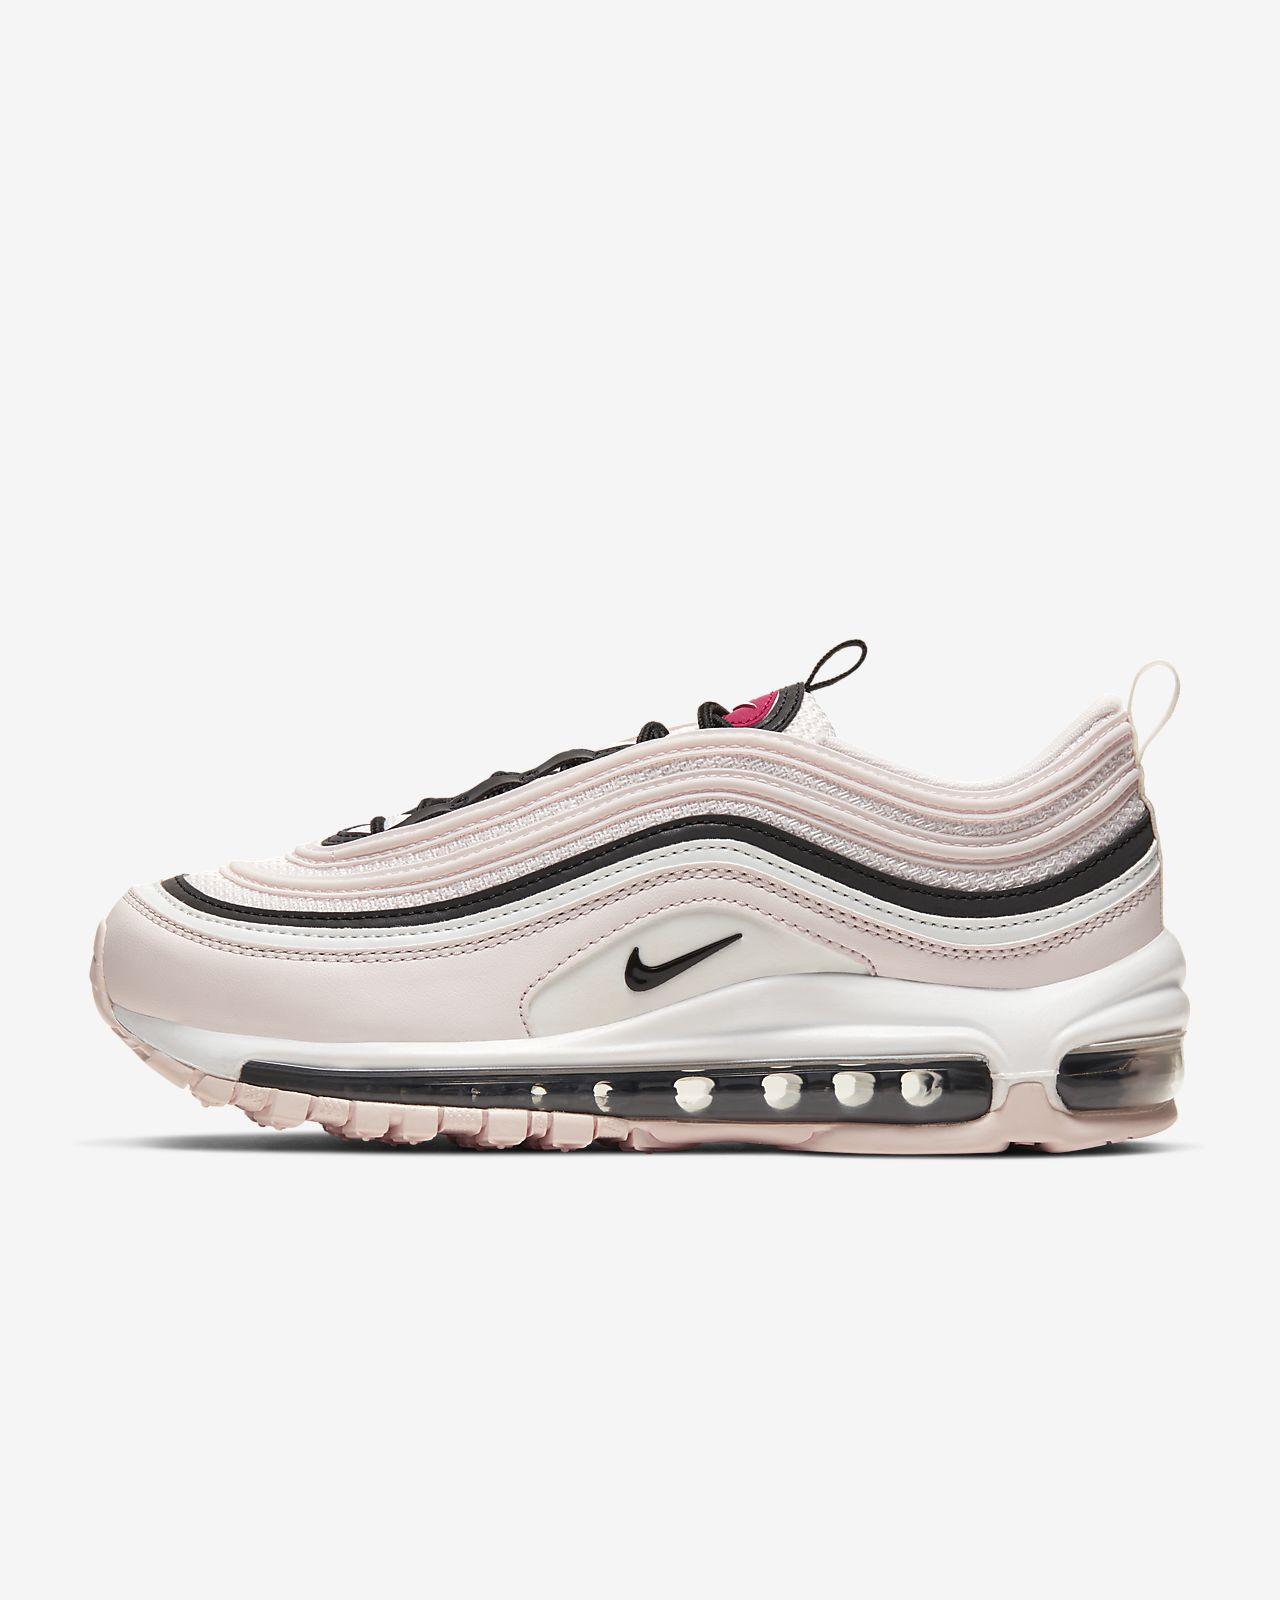 Nike Air Max 97 Premium Sneaker Damen Größe UK 6 40 NEU